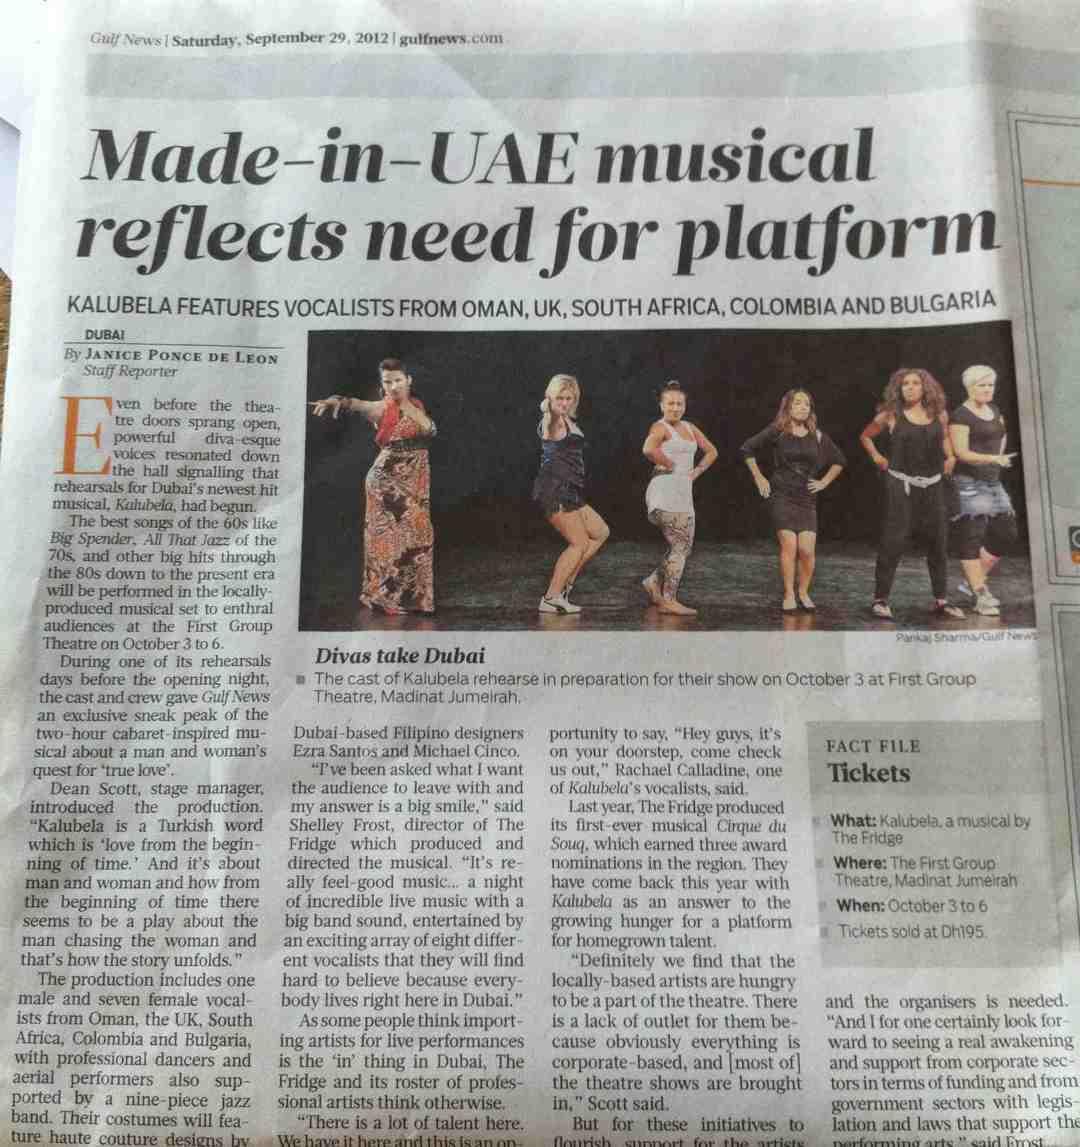 Kalubela Gulf News 2012, Dubai